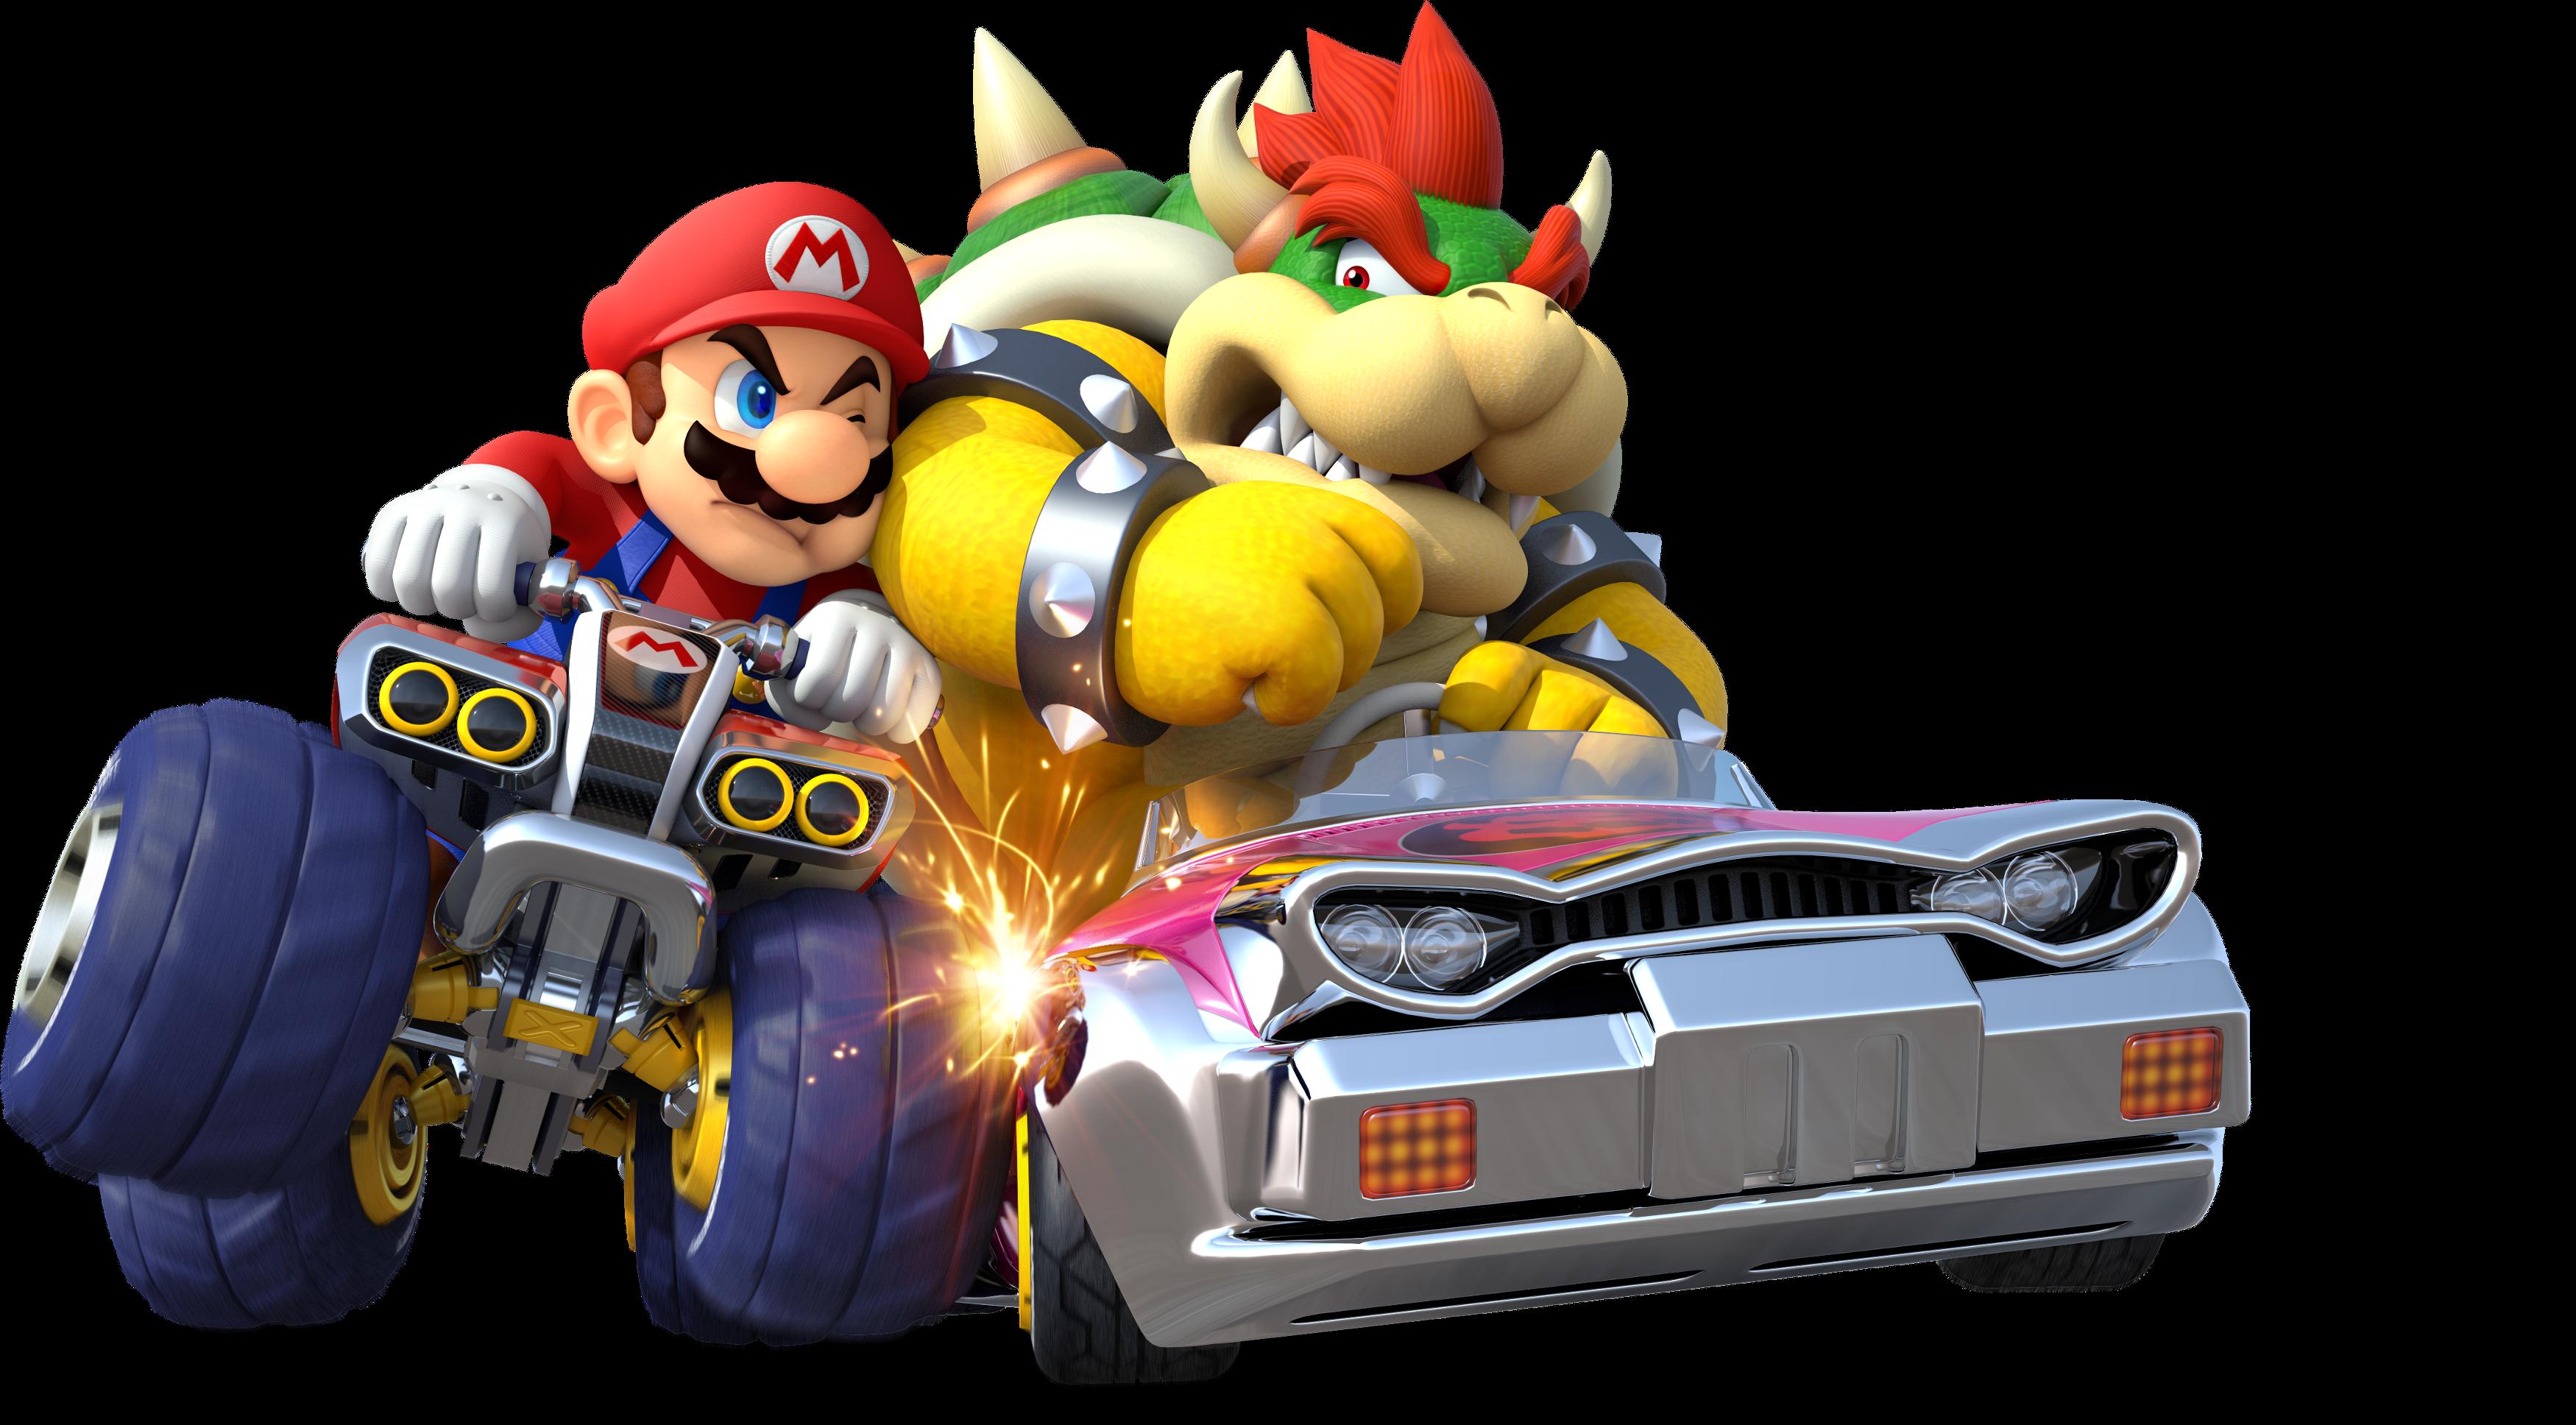 Rechargegaming Com Images Mario Kart 0793 Png Mario Kart Characters Mario Kart Mario